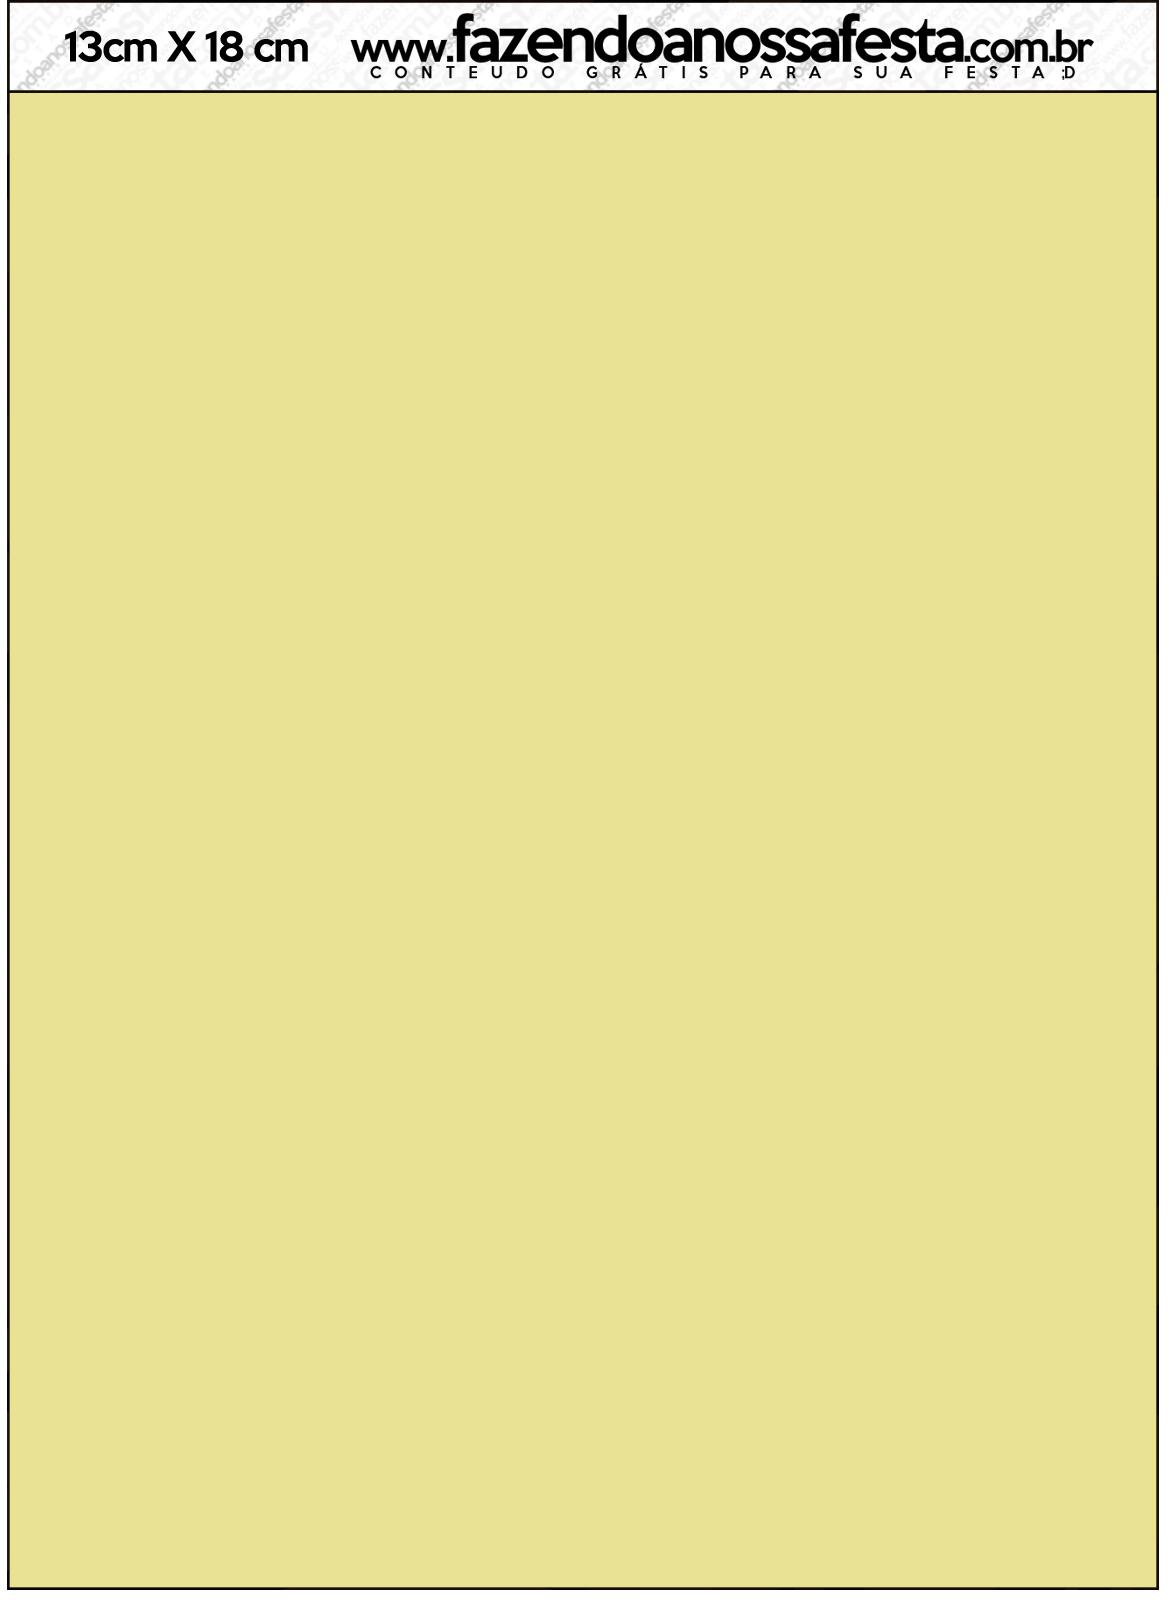 Convite com Envelope Kit Militar Camuflado